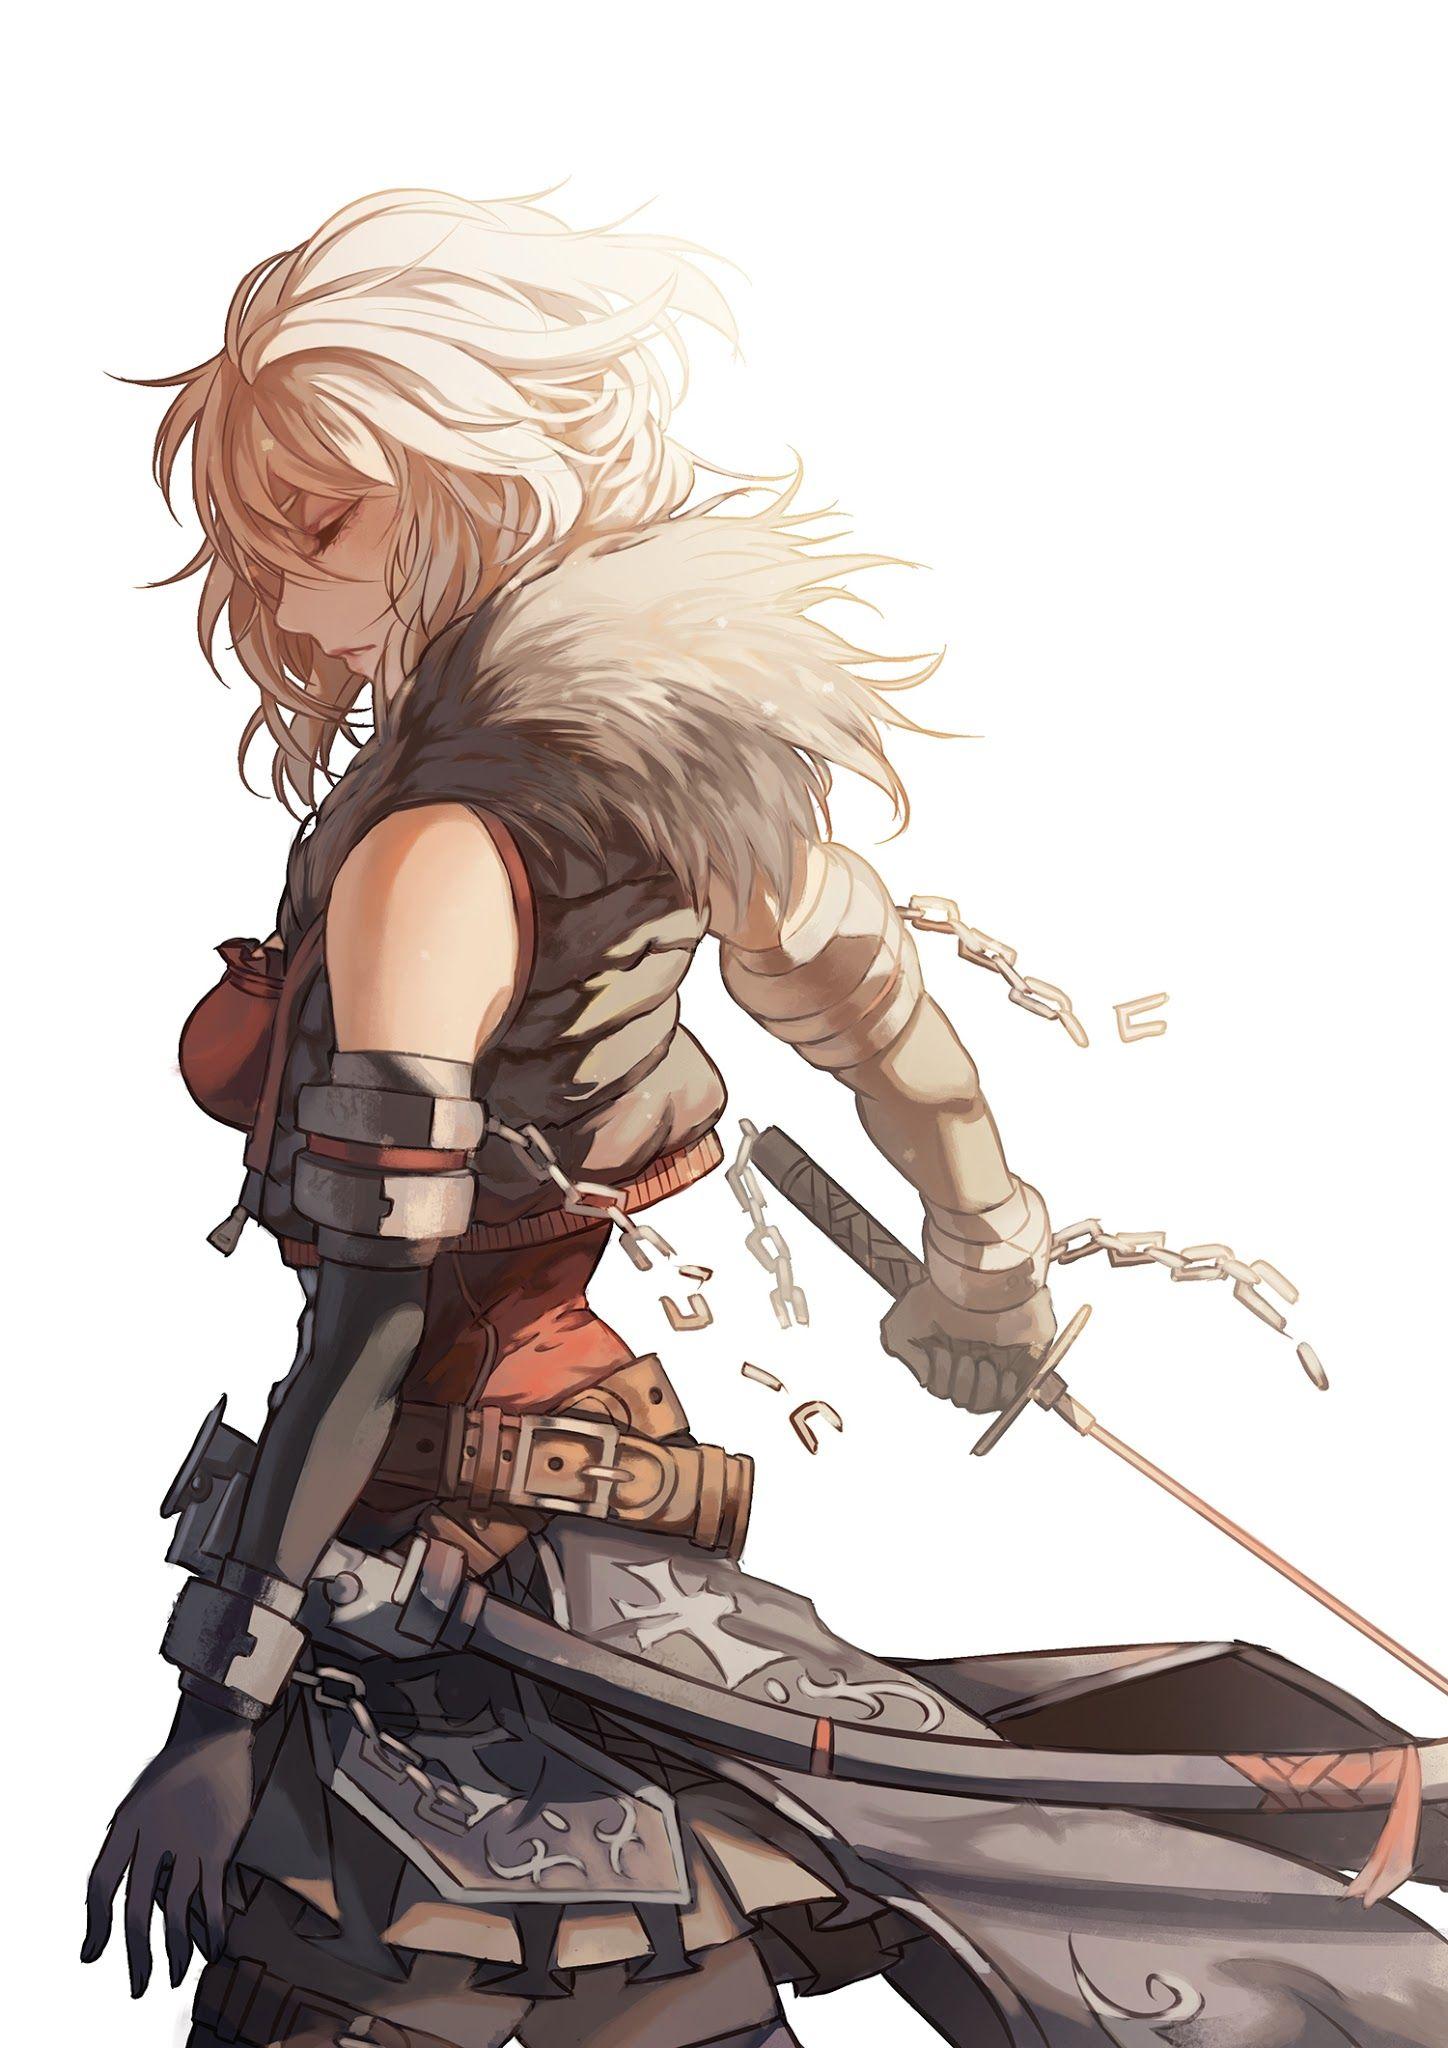 Pin by elizabeth wrenn on other illustration drawing - Anime female warrior ...